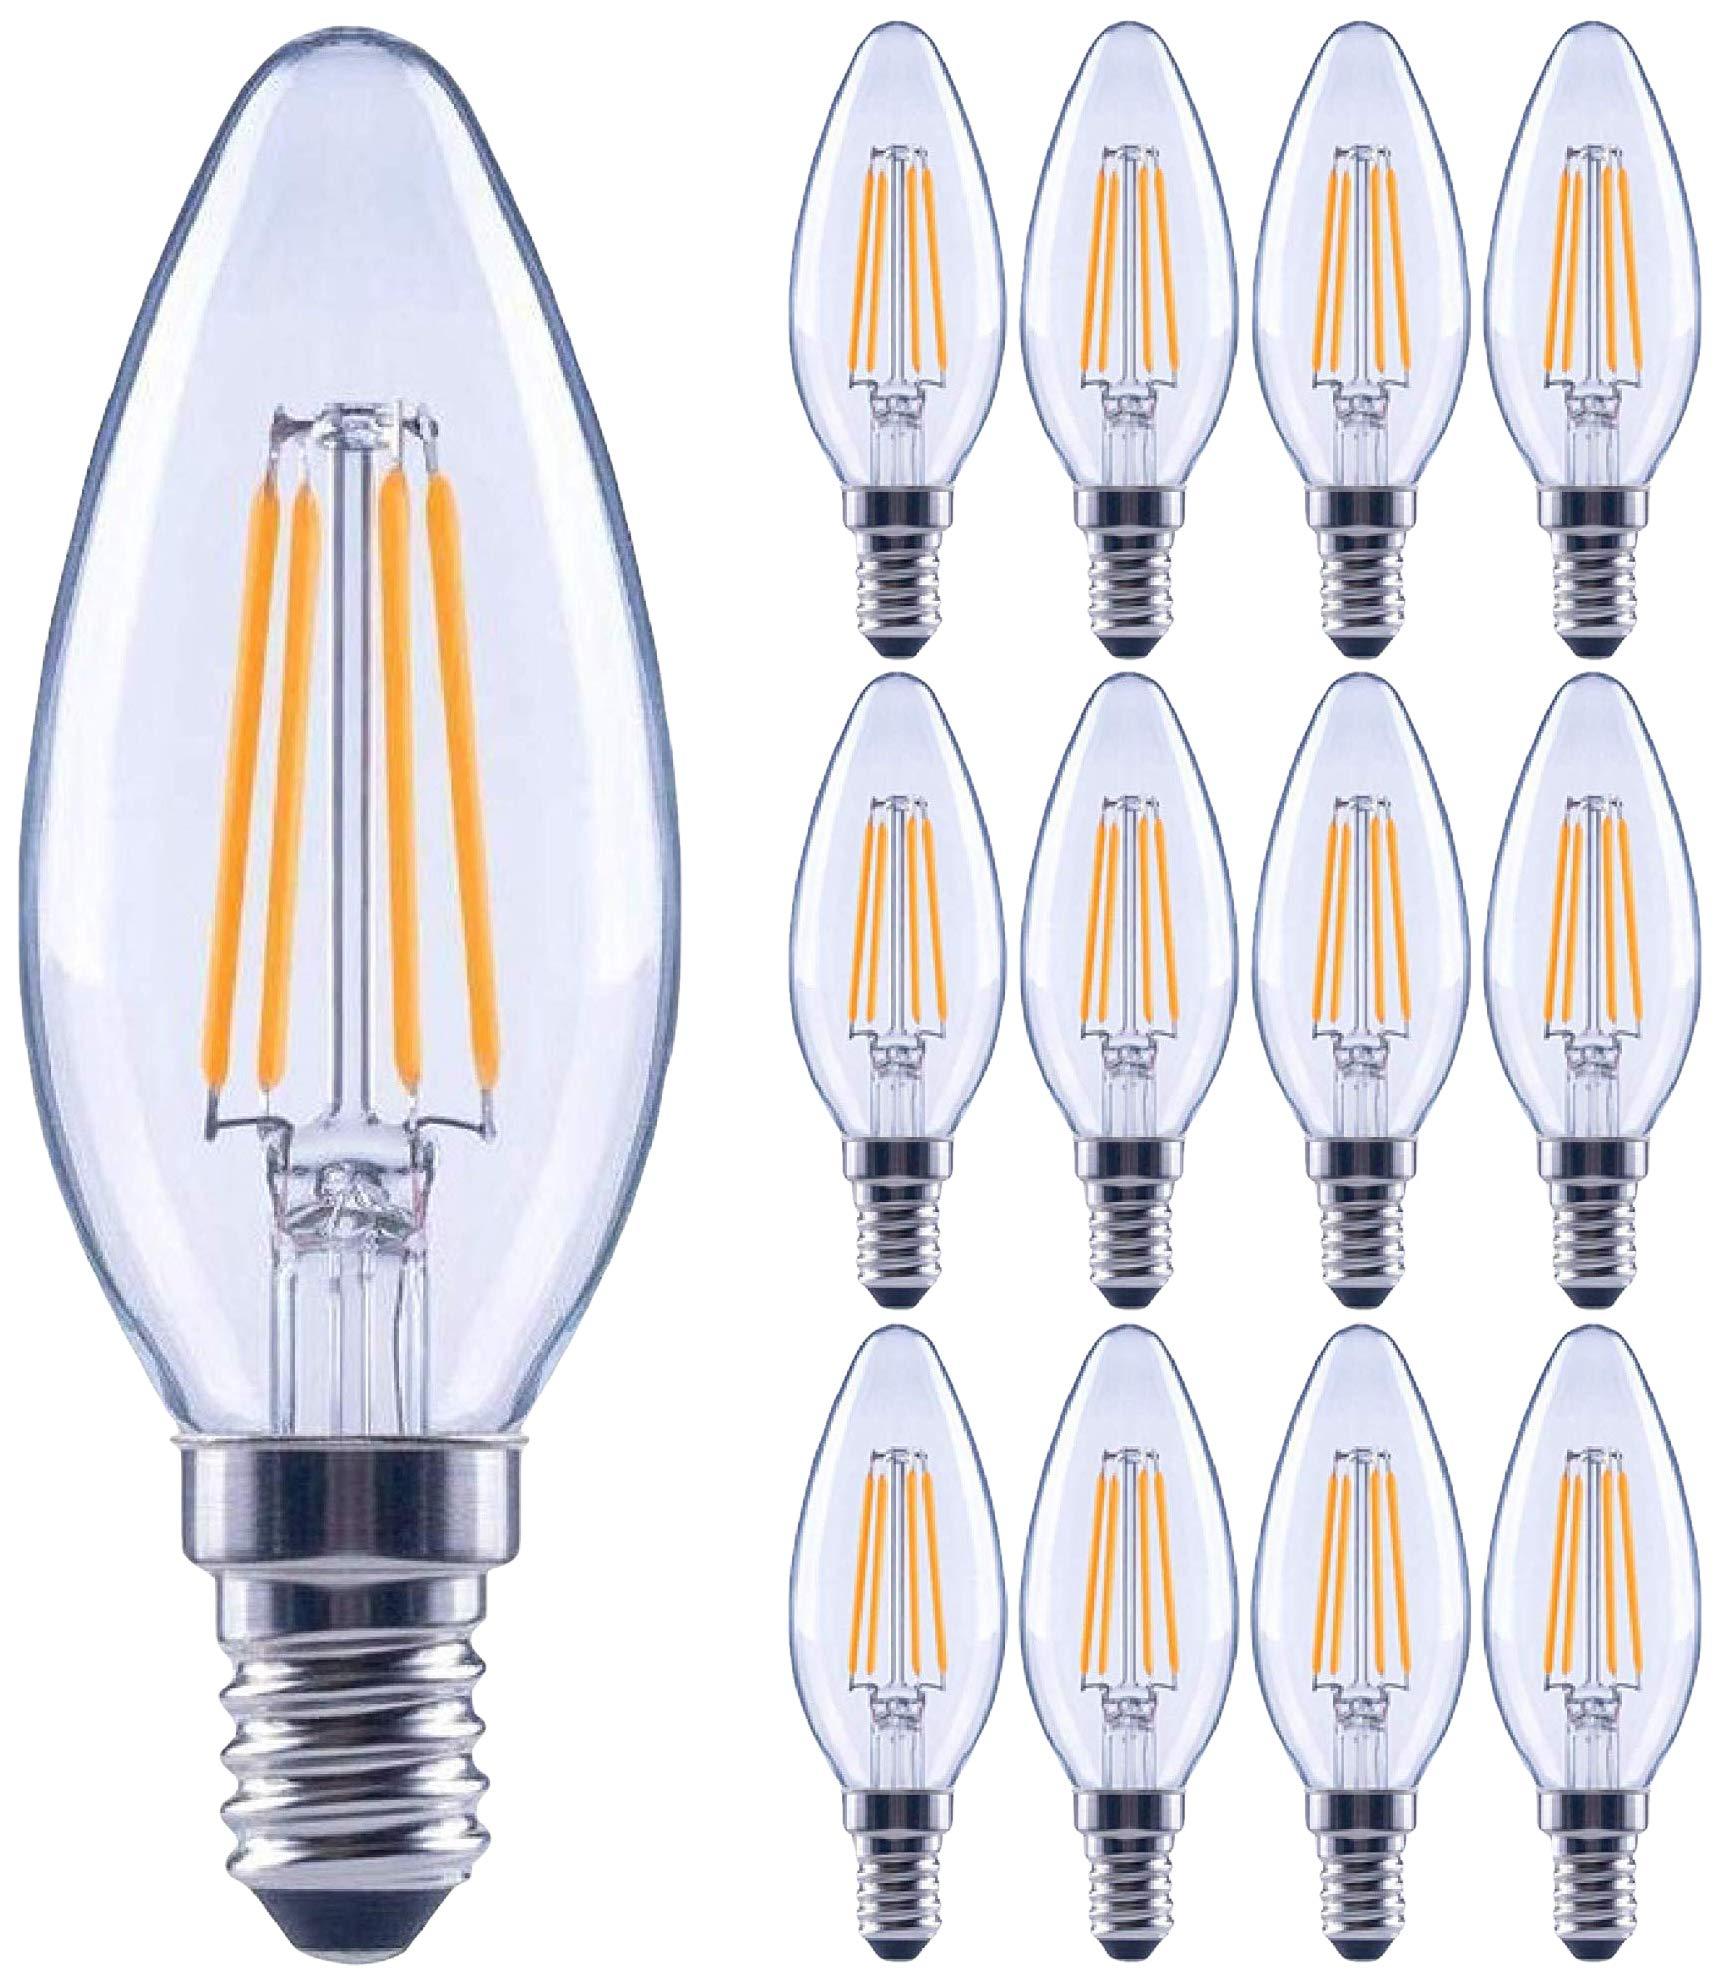 12 Pack 60 Watt Equivalent Led E12 Candelabra Base B11 Dimmable Clear Filament Vintage Style Light Bulb 2700k Warm White Decorative 60w Led Chandelier Ceiling Fan Bulbs